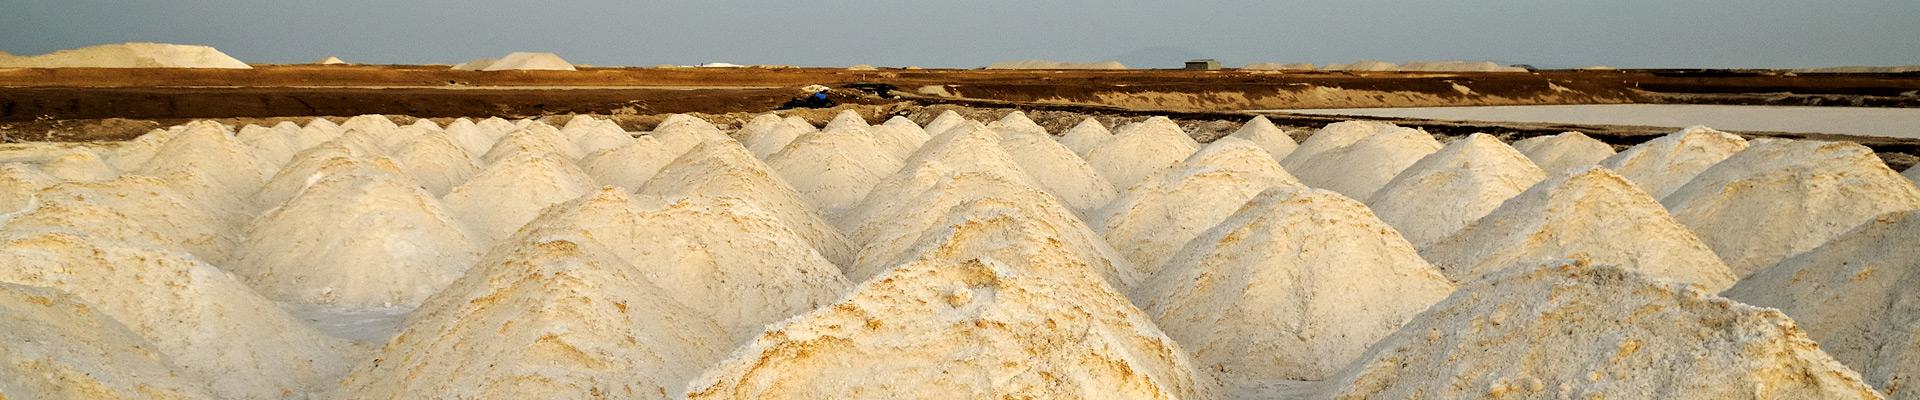 Top image tas de sel à Afdera, Ethiopie